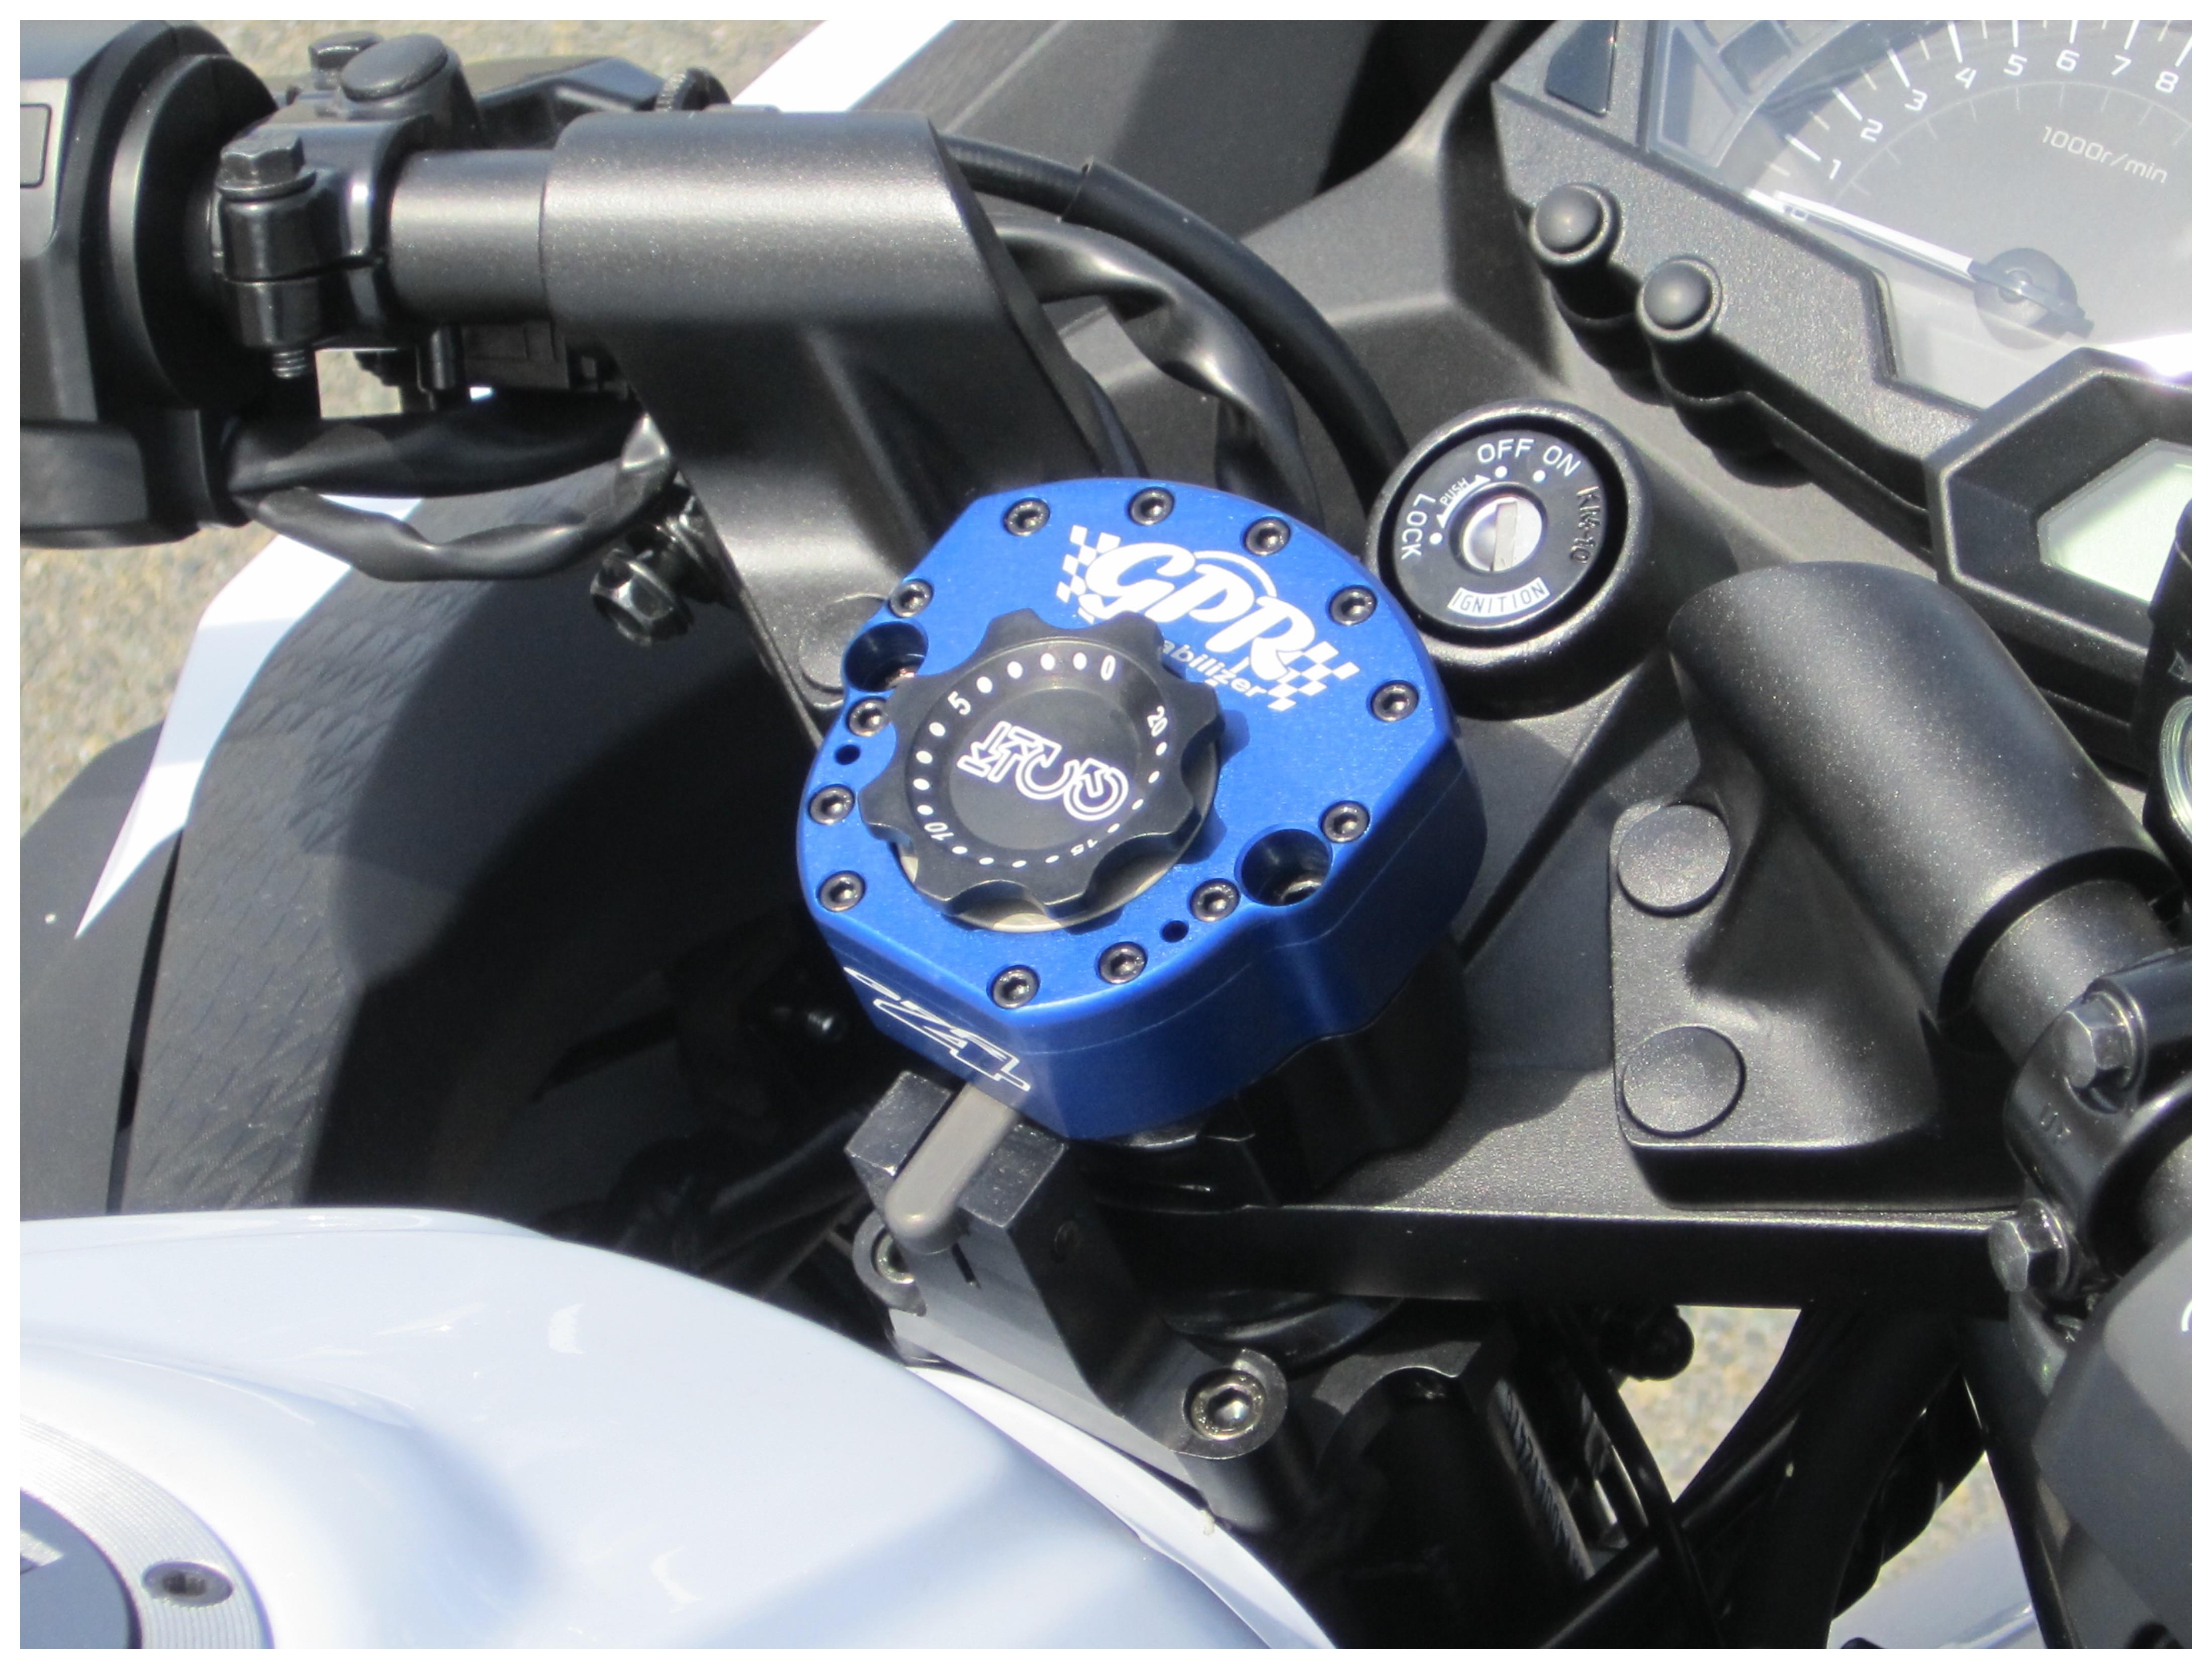 GPR V4 Stabilizer Kawasaki Ninja 300 2013-2018